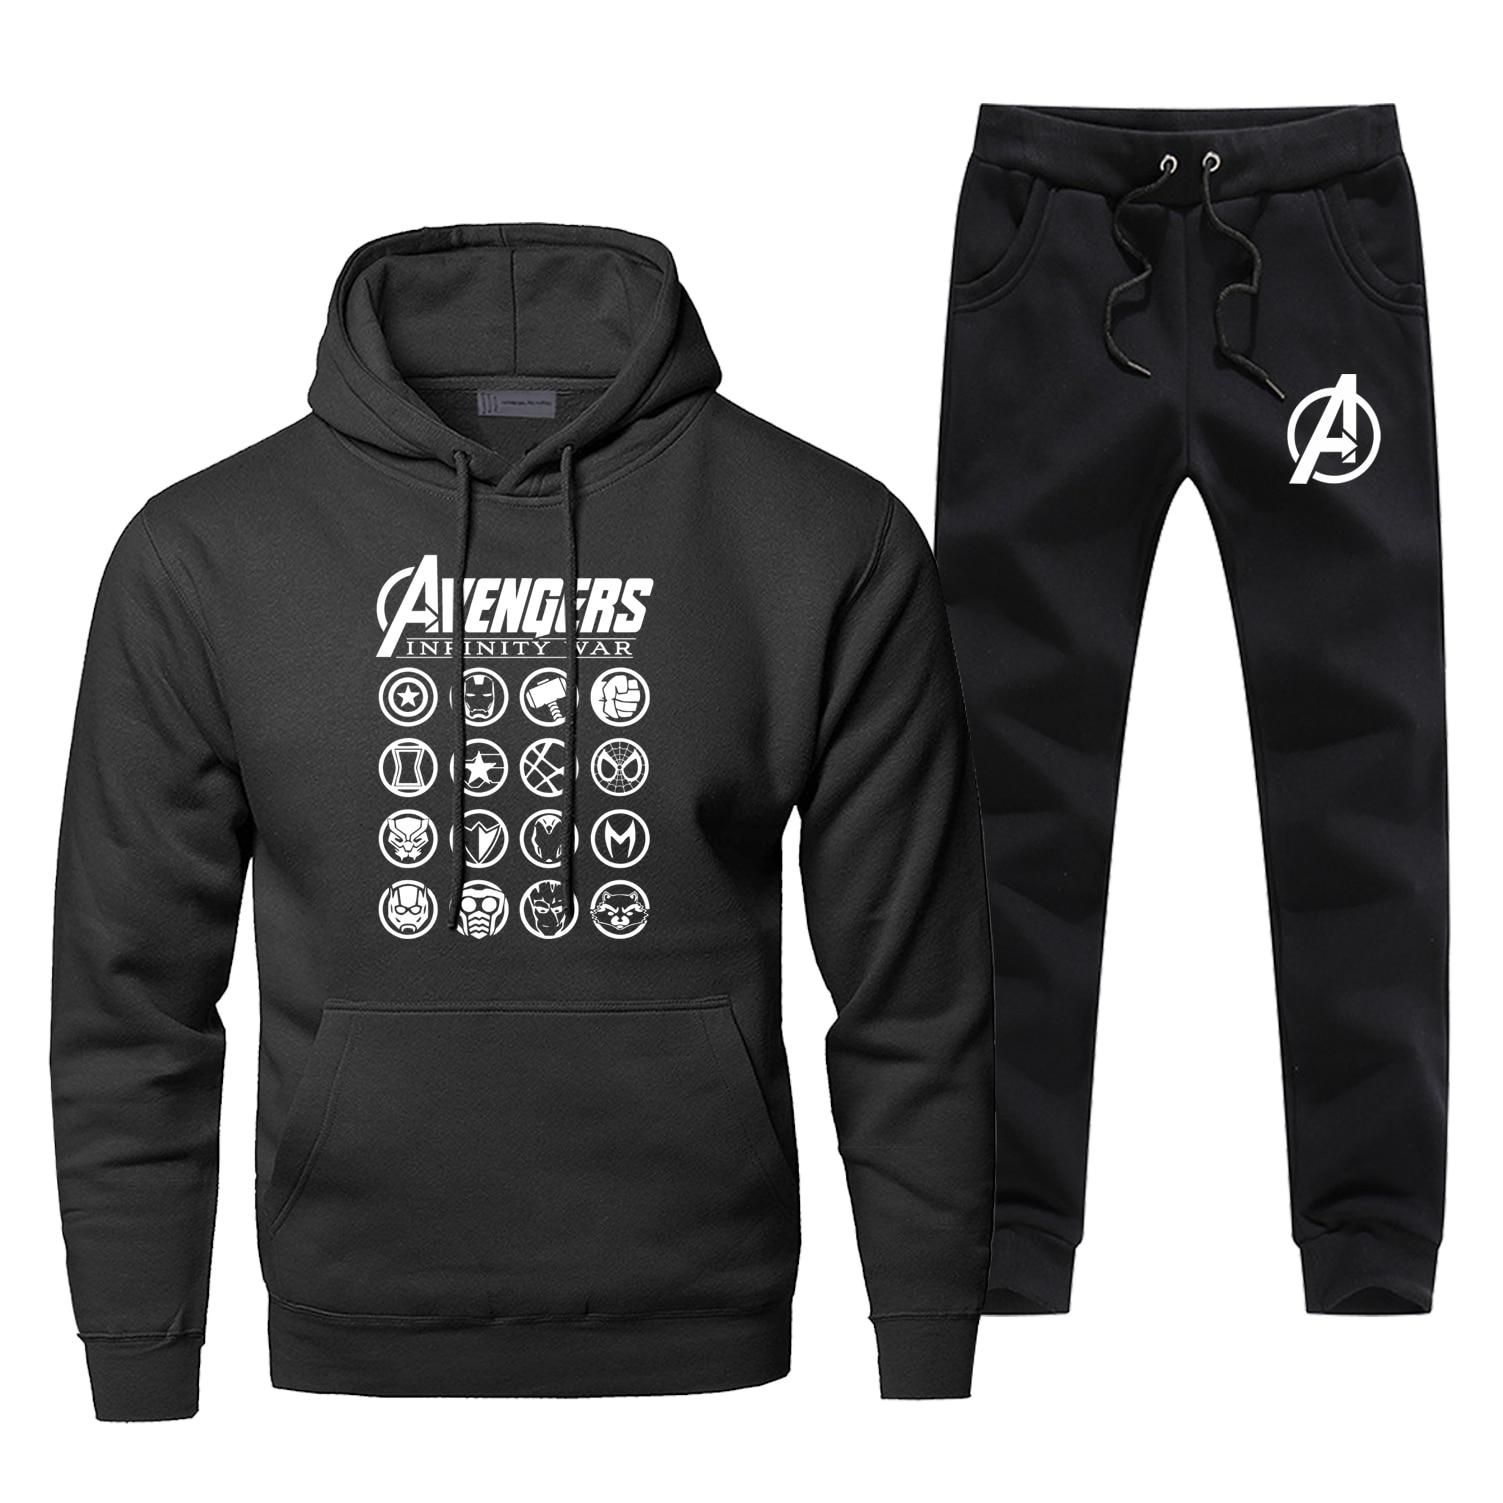 Avengers Hoodie Pants Set Super Hero Men Sweatshirt Male Hoodies Sweatshirts Mens Sets Two Piece Pant Pullover Iron Man Coats